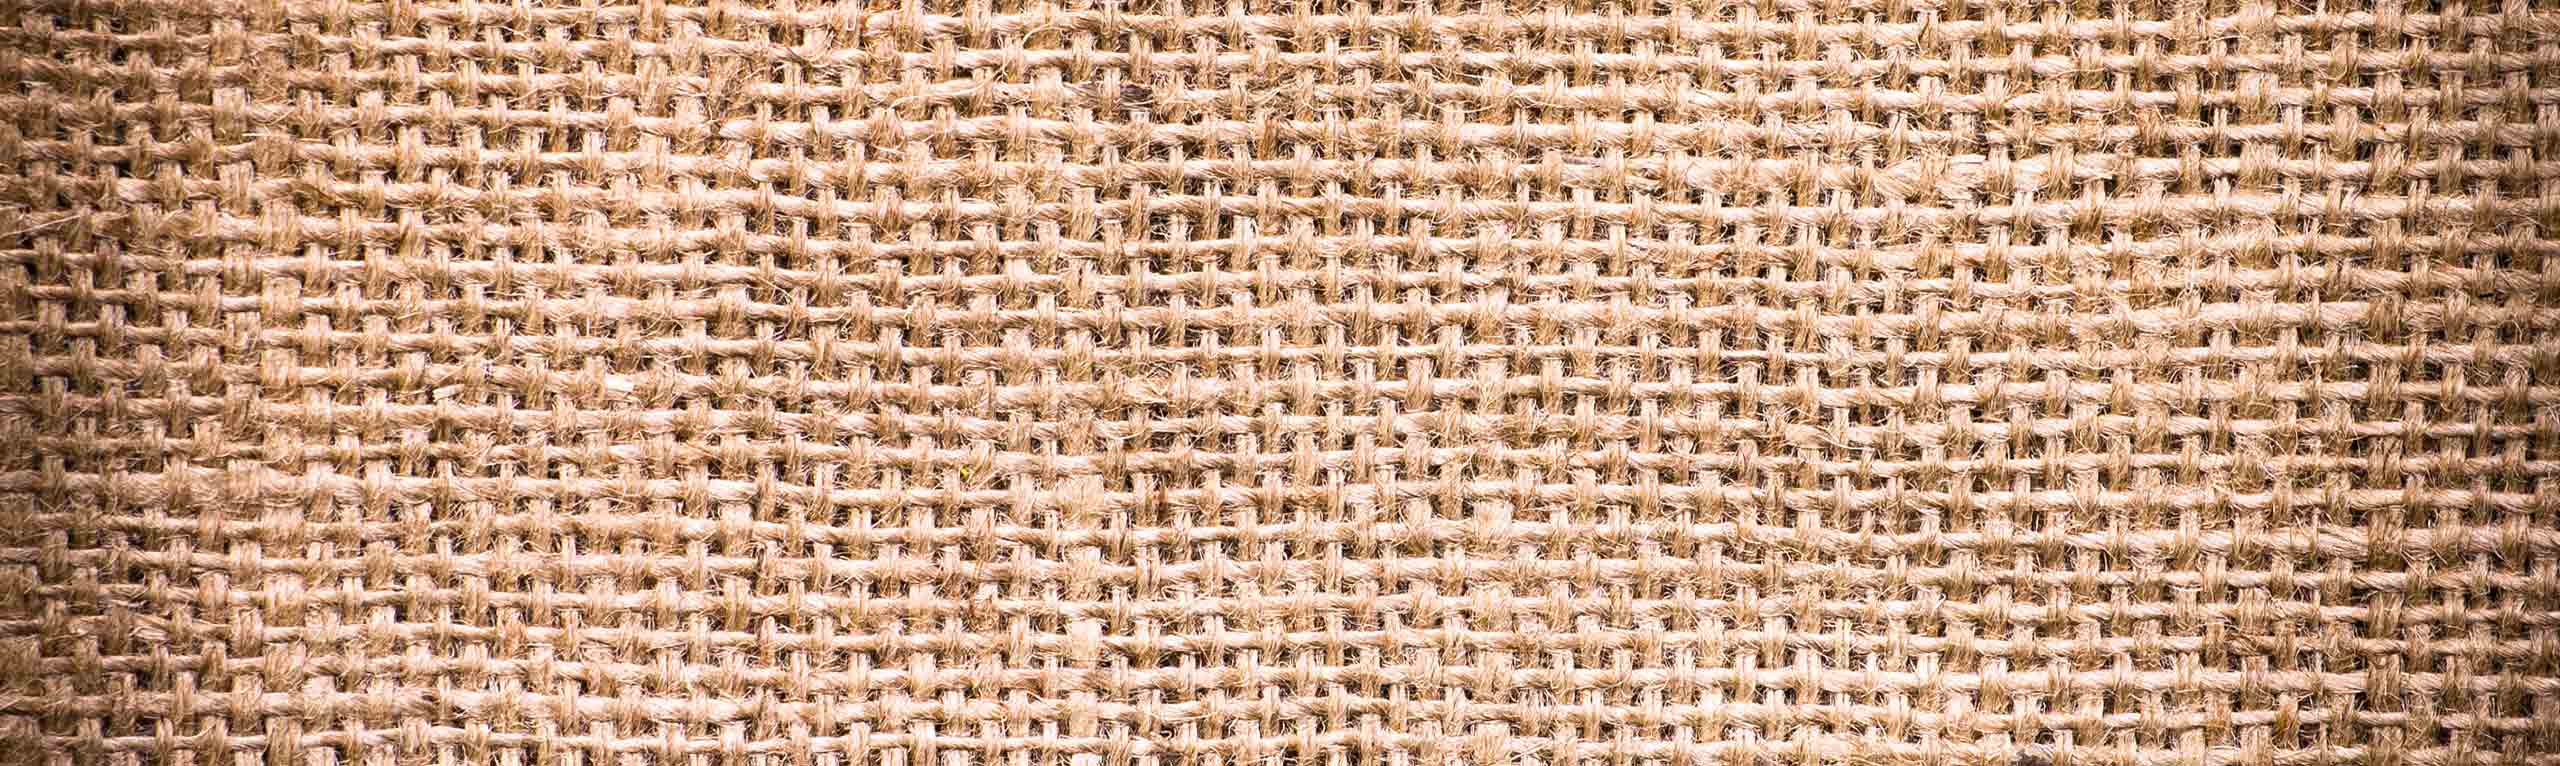 Coconut-Philippines-Sack